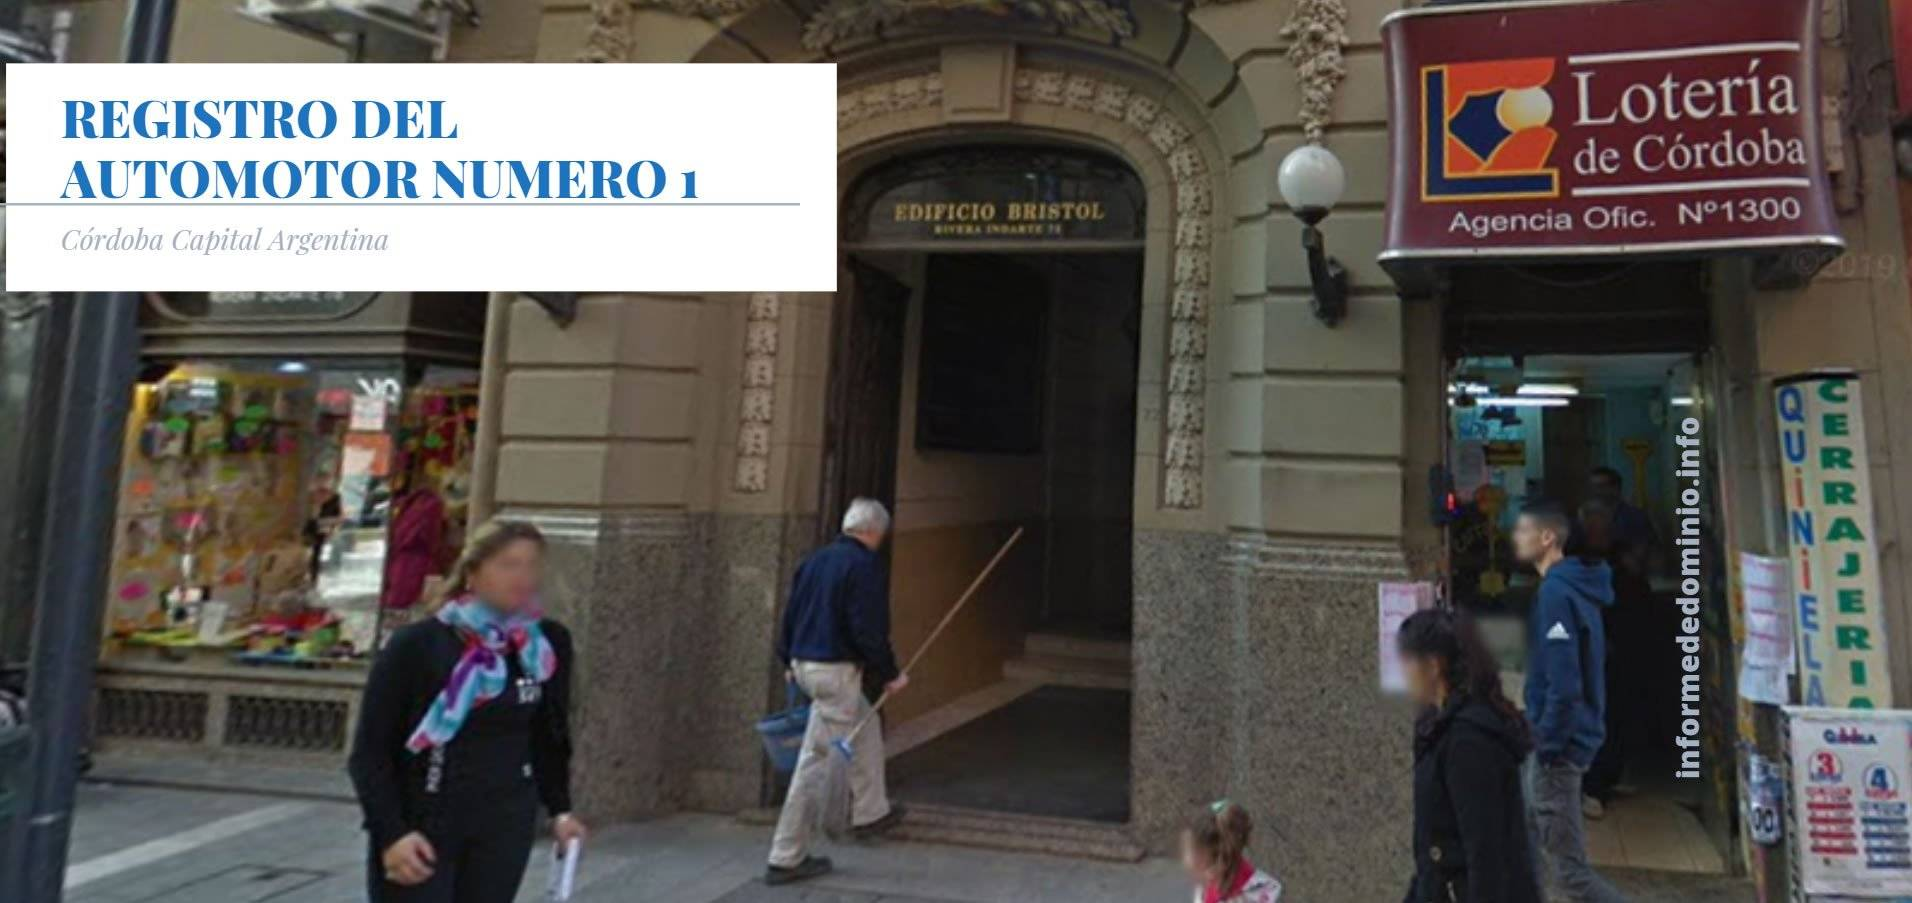 Registro Automotor Número 1 de Córdoba Capital